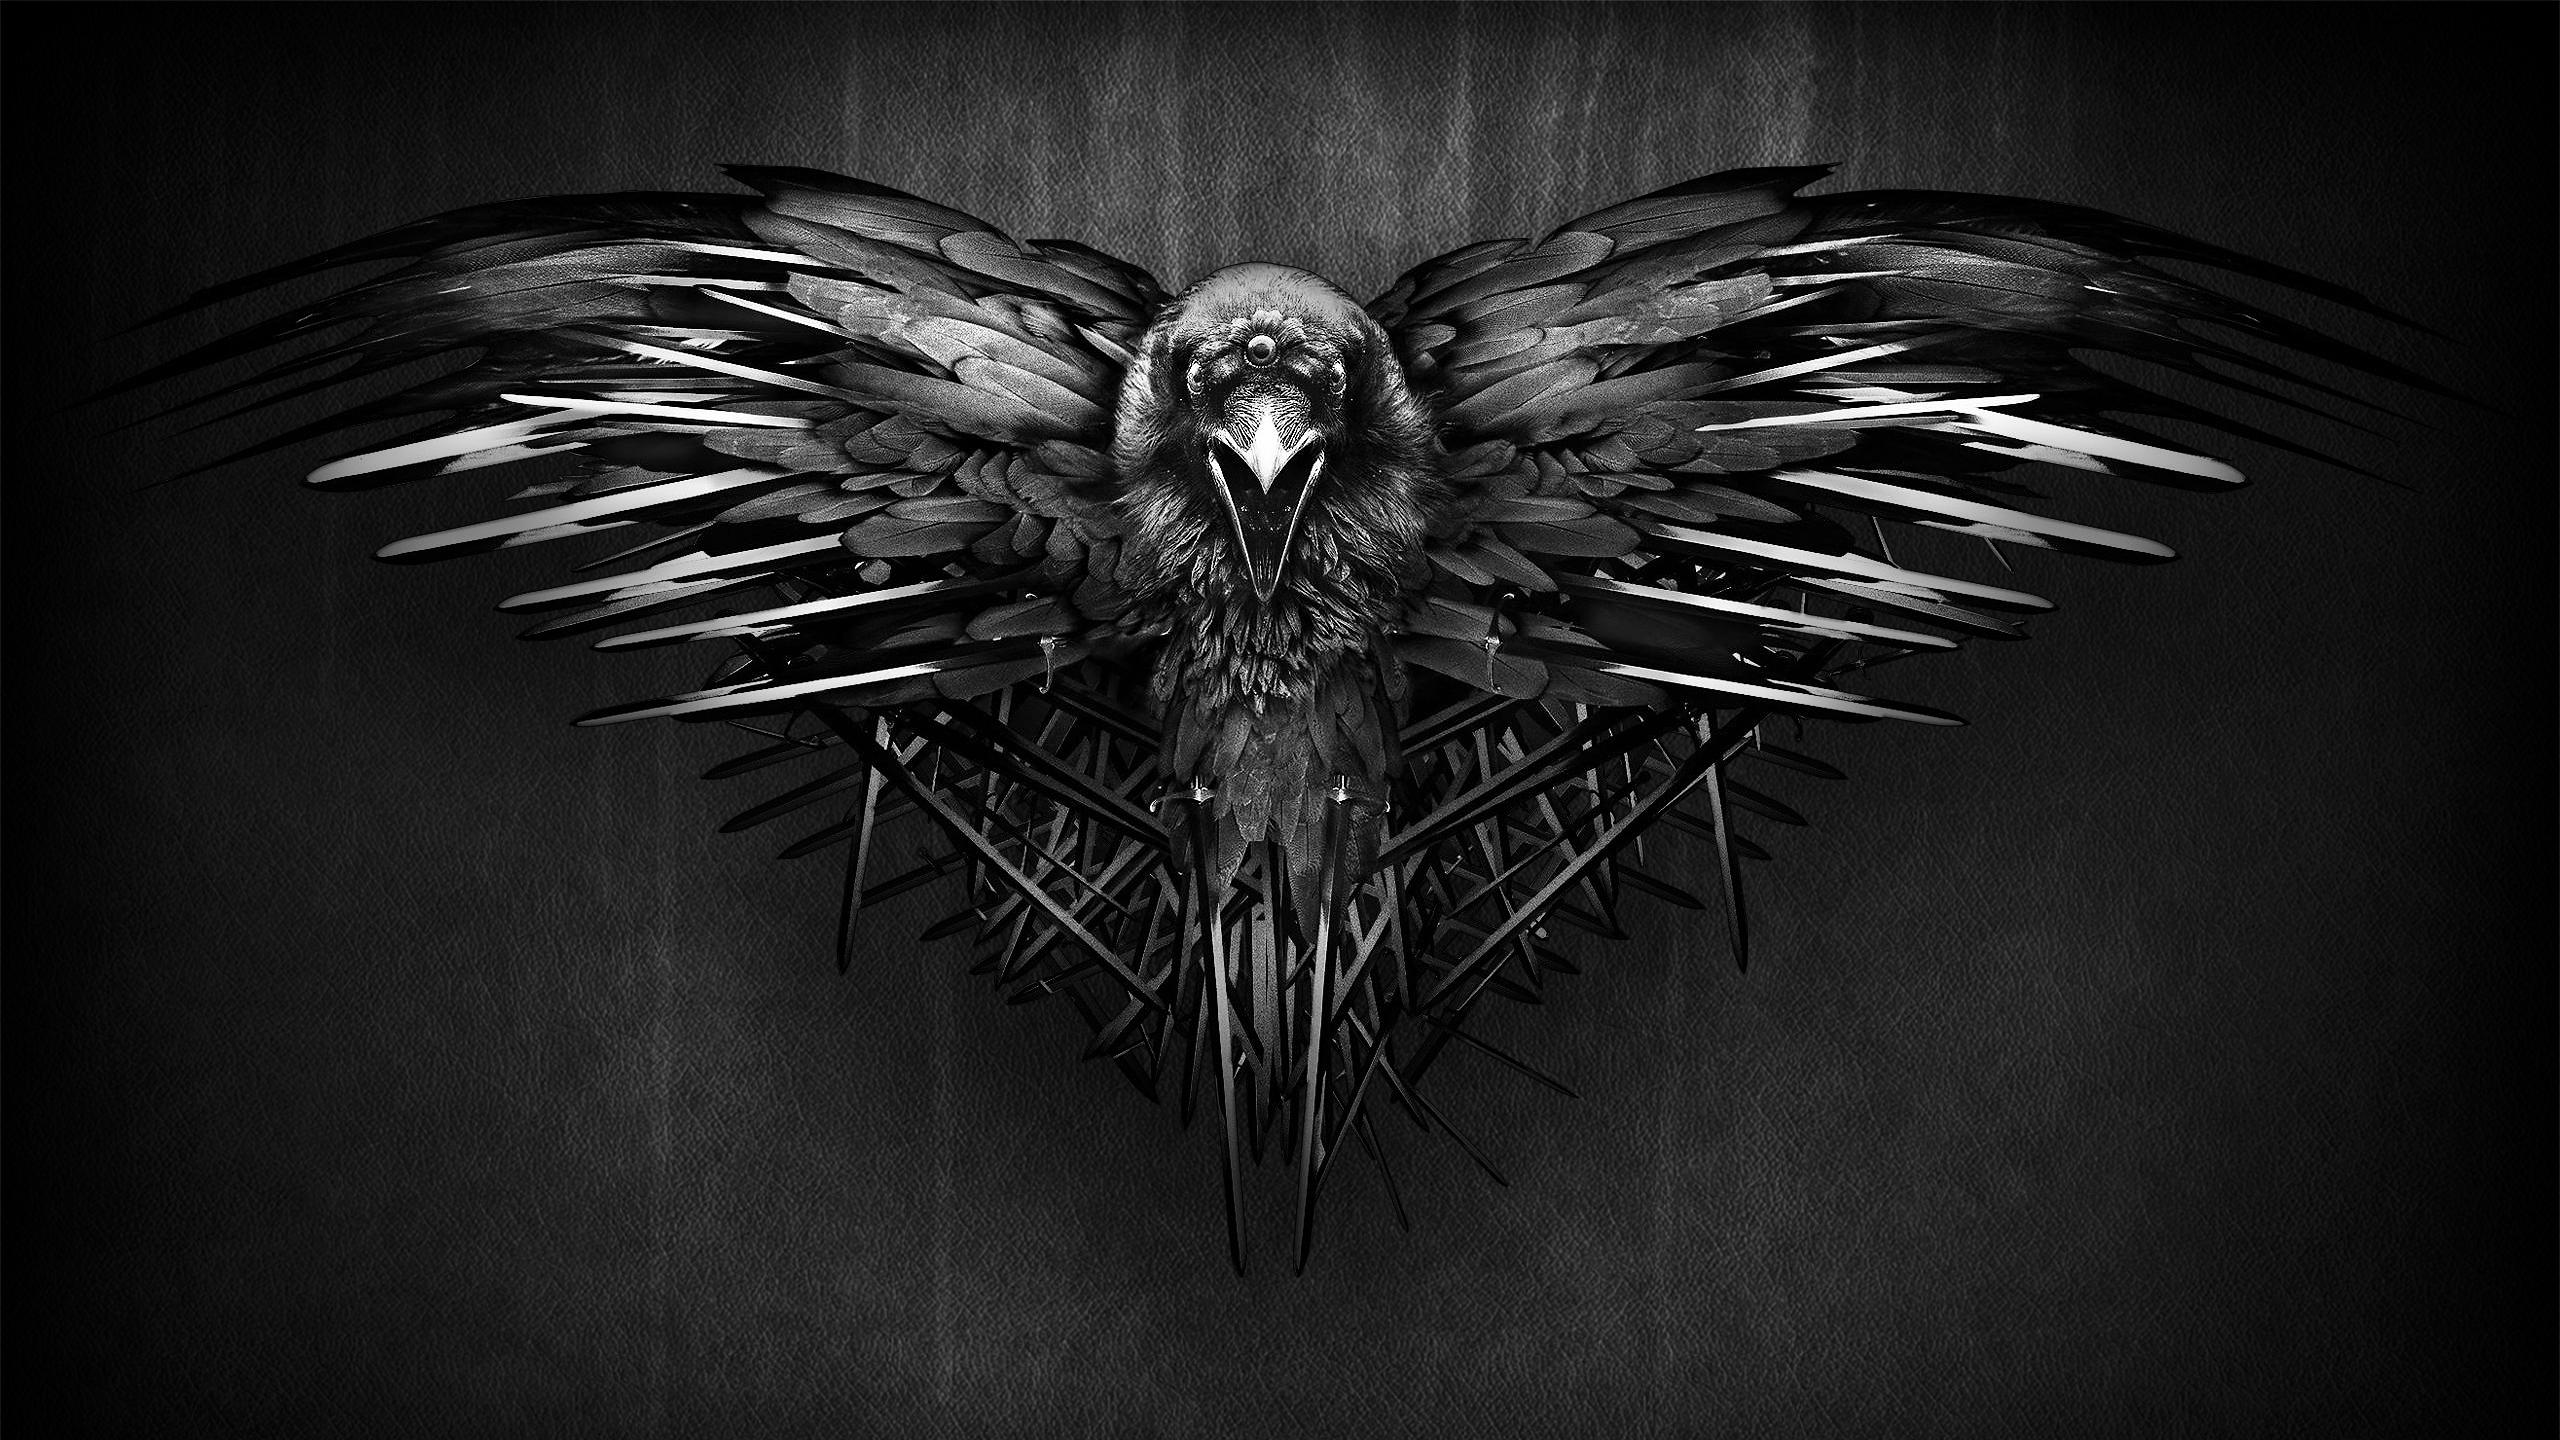 [No Spoilers] Raven Wallpaper With Dark Background Imgur